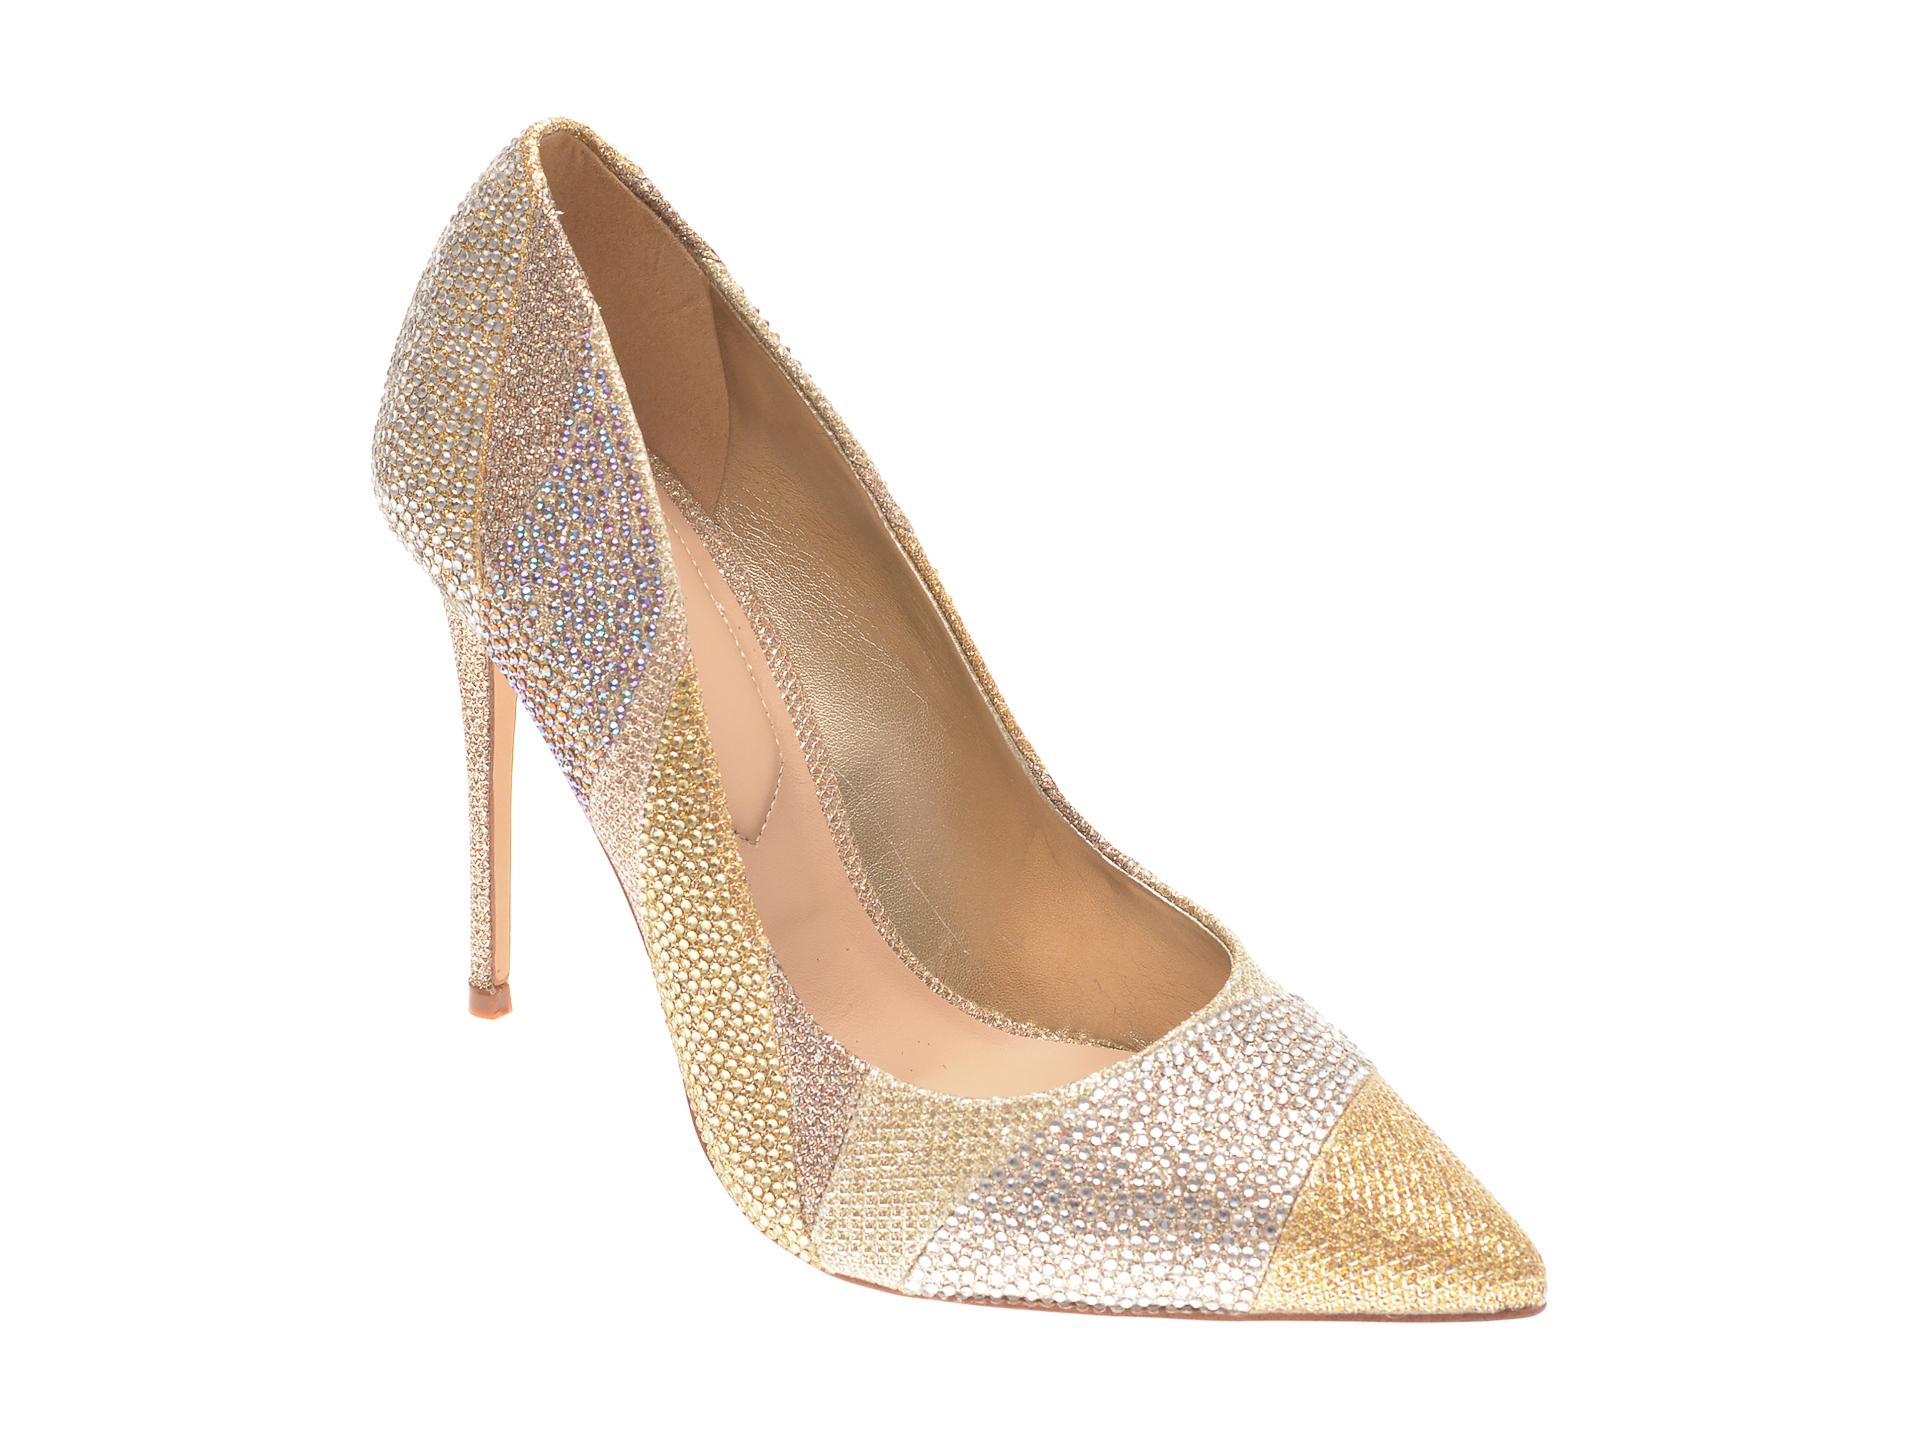 Pantofi ALDO aurii, Kalimna711, din material textil imagine otter.ro 2021